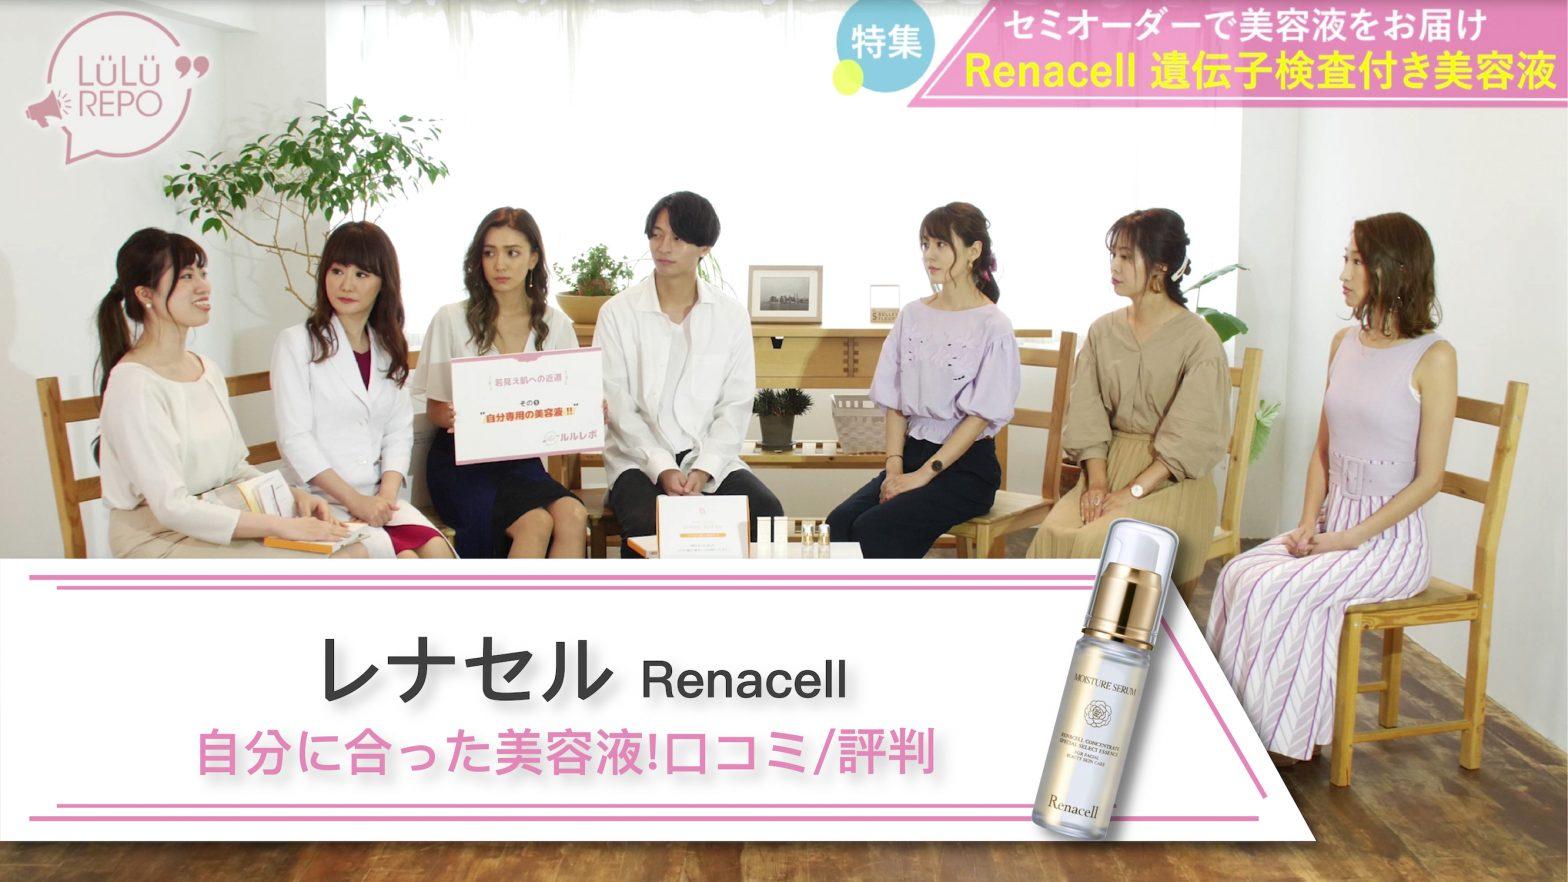 Renacell(レナセル)を検証!セミオーダーできる自分専用の美容液レナセルの効果から使い方、口コミ/評判をルルレポで特集!